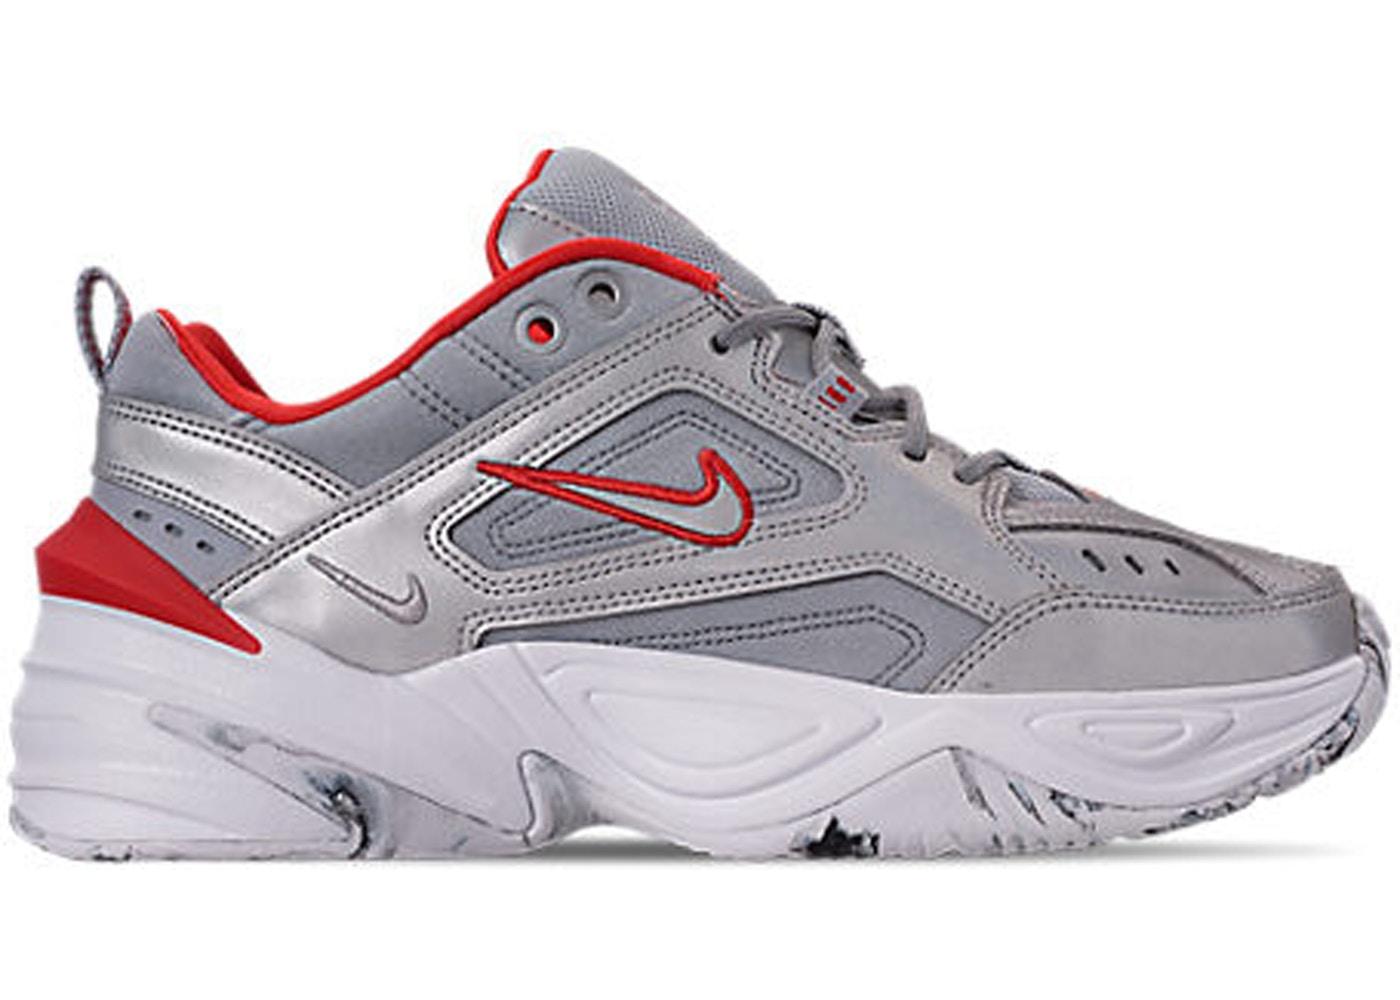 94b824ad5e0 Nike M2K Tekno Metallic Silver Marbled (W) - BQ3378-001